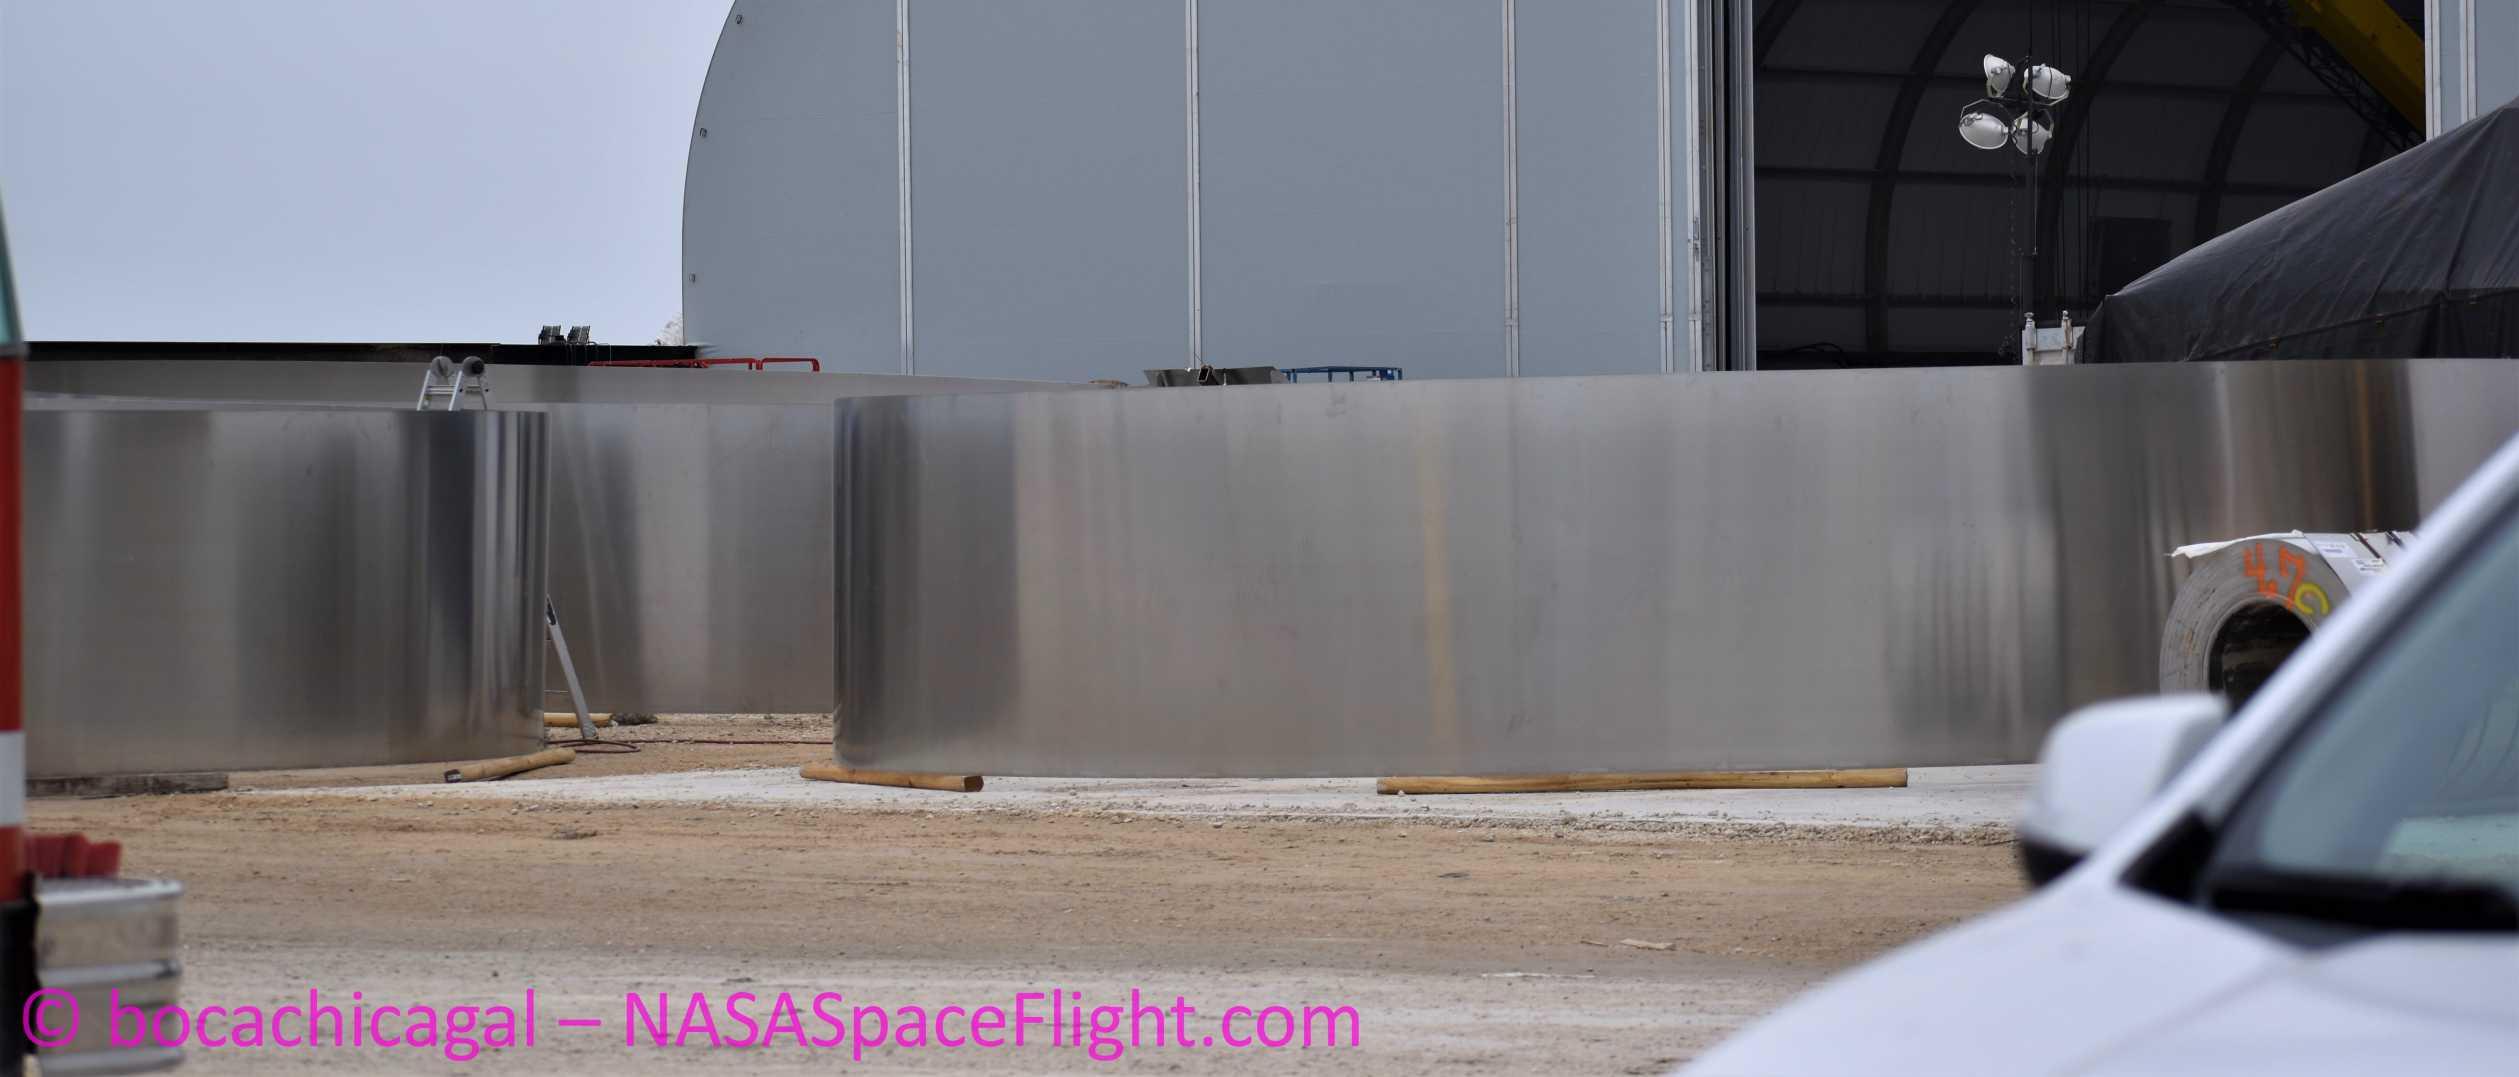 Starship Boca Chica 020320 (NASASpaceflight – bocachicagal) ring work 5 crop (c)